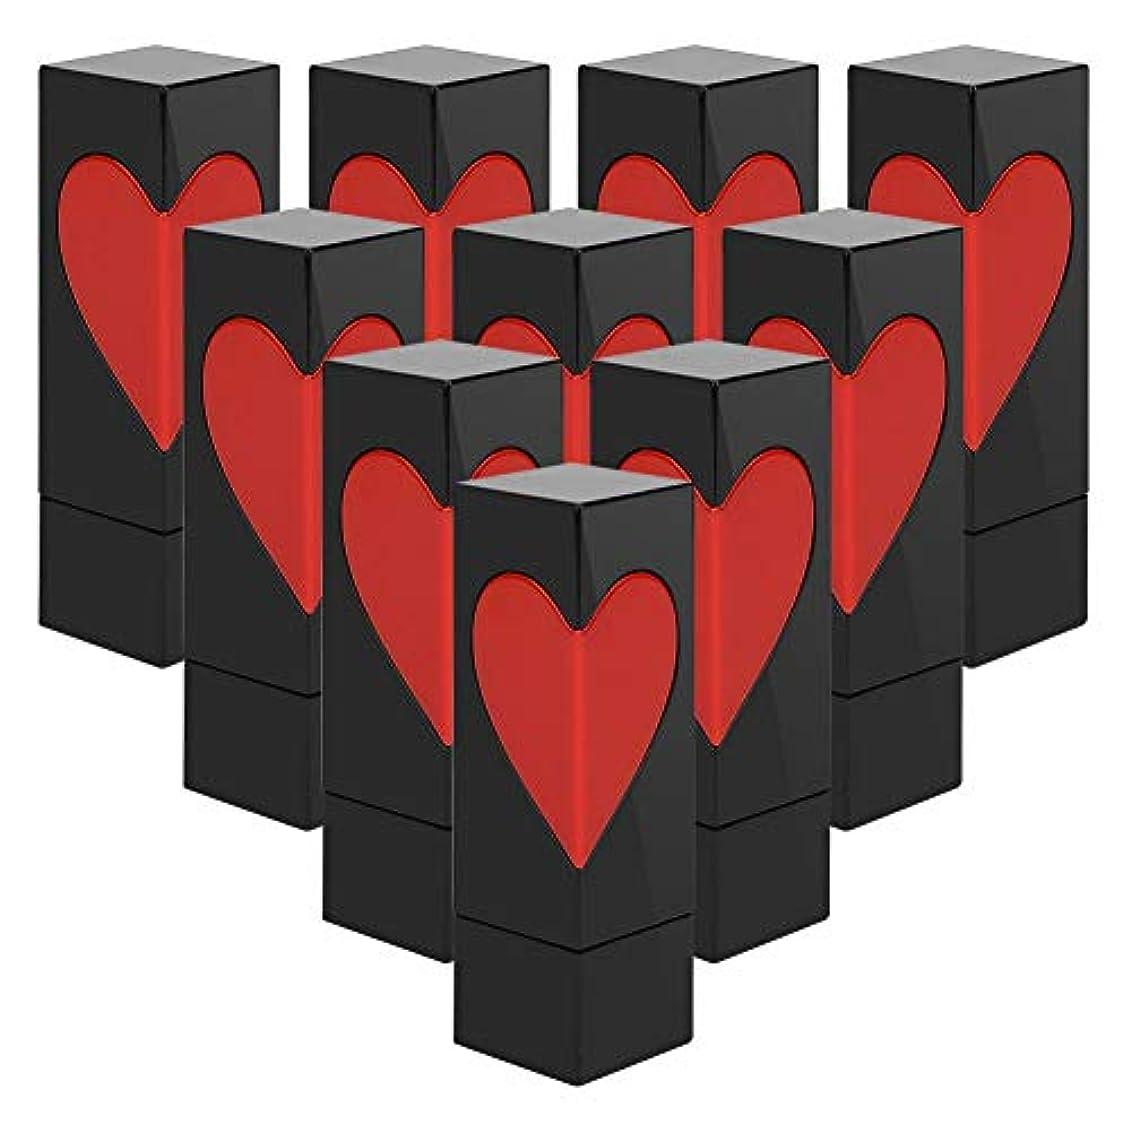 Semmeの空の口紅の管、愛の心の空のDIYの口紅の容器の自作の口紅型のリップ?クリームの管(テンオップバッグ)